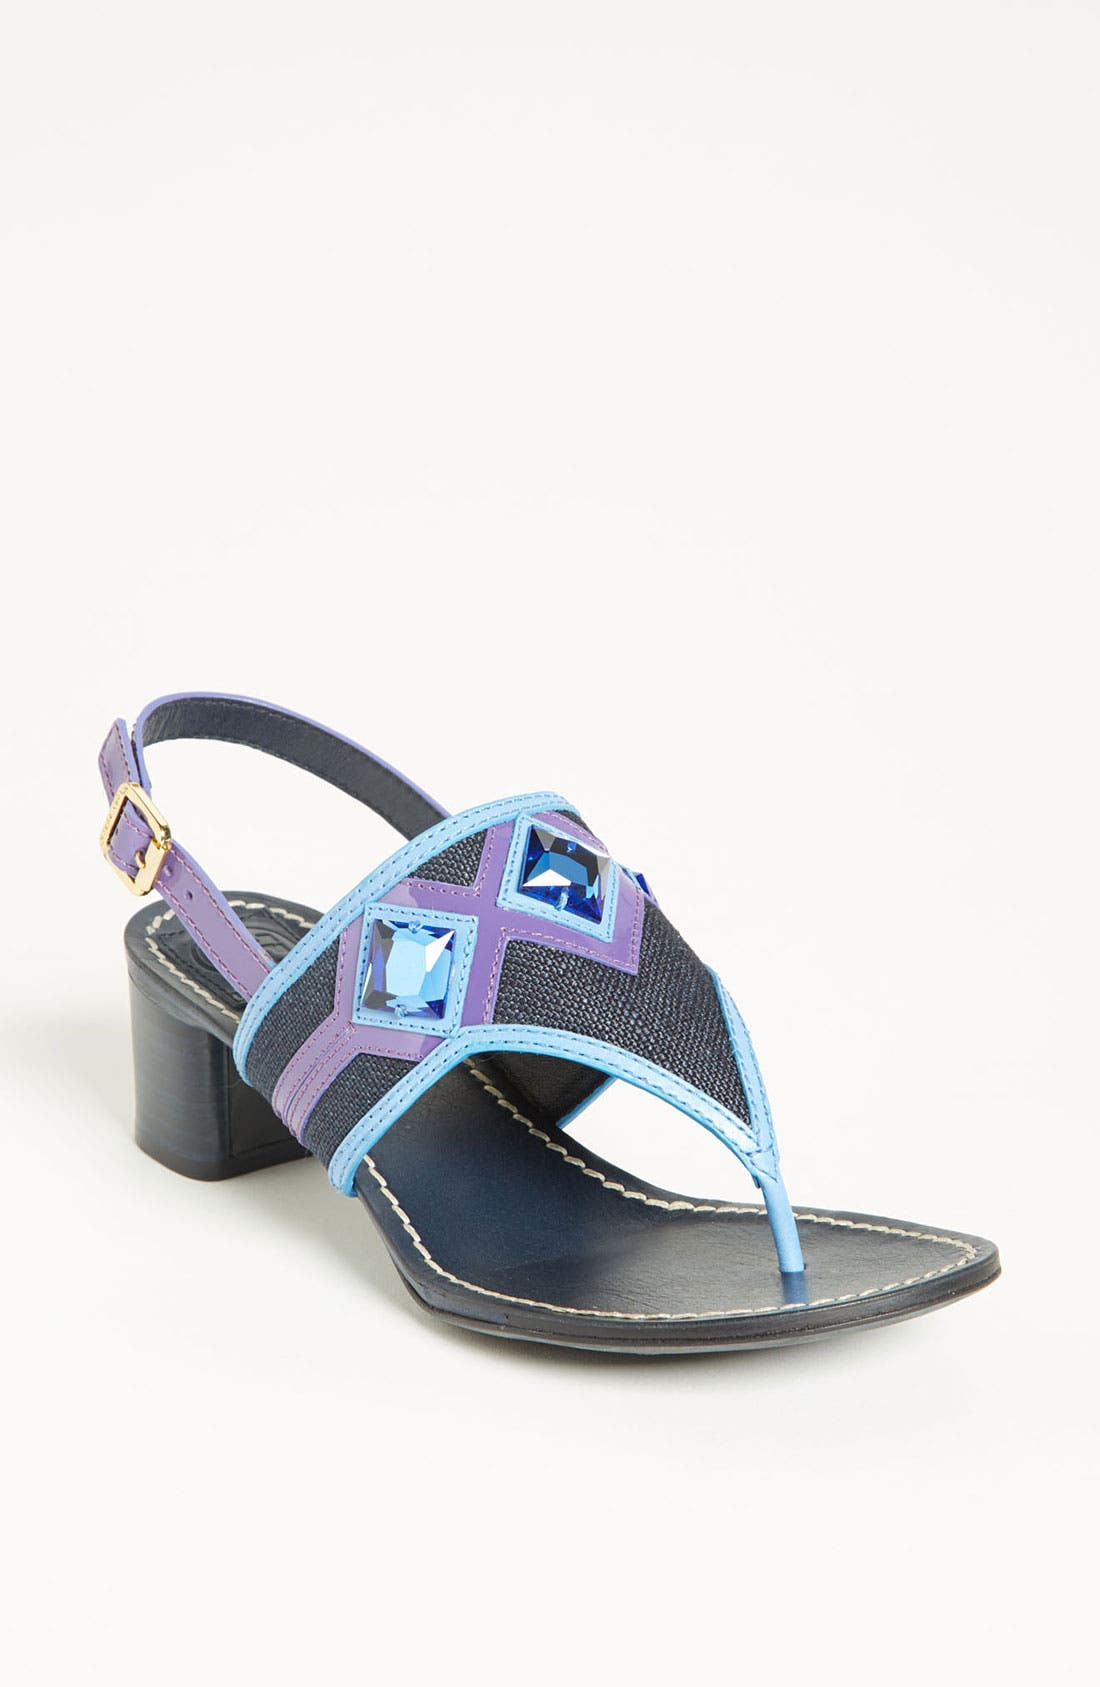 Alternate Image 1 Selected - Tory Burch 'Etta' Sandal